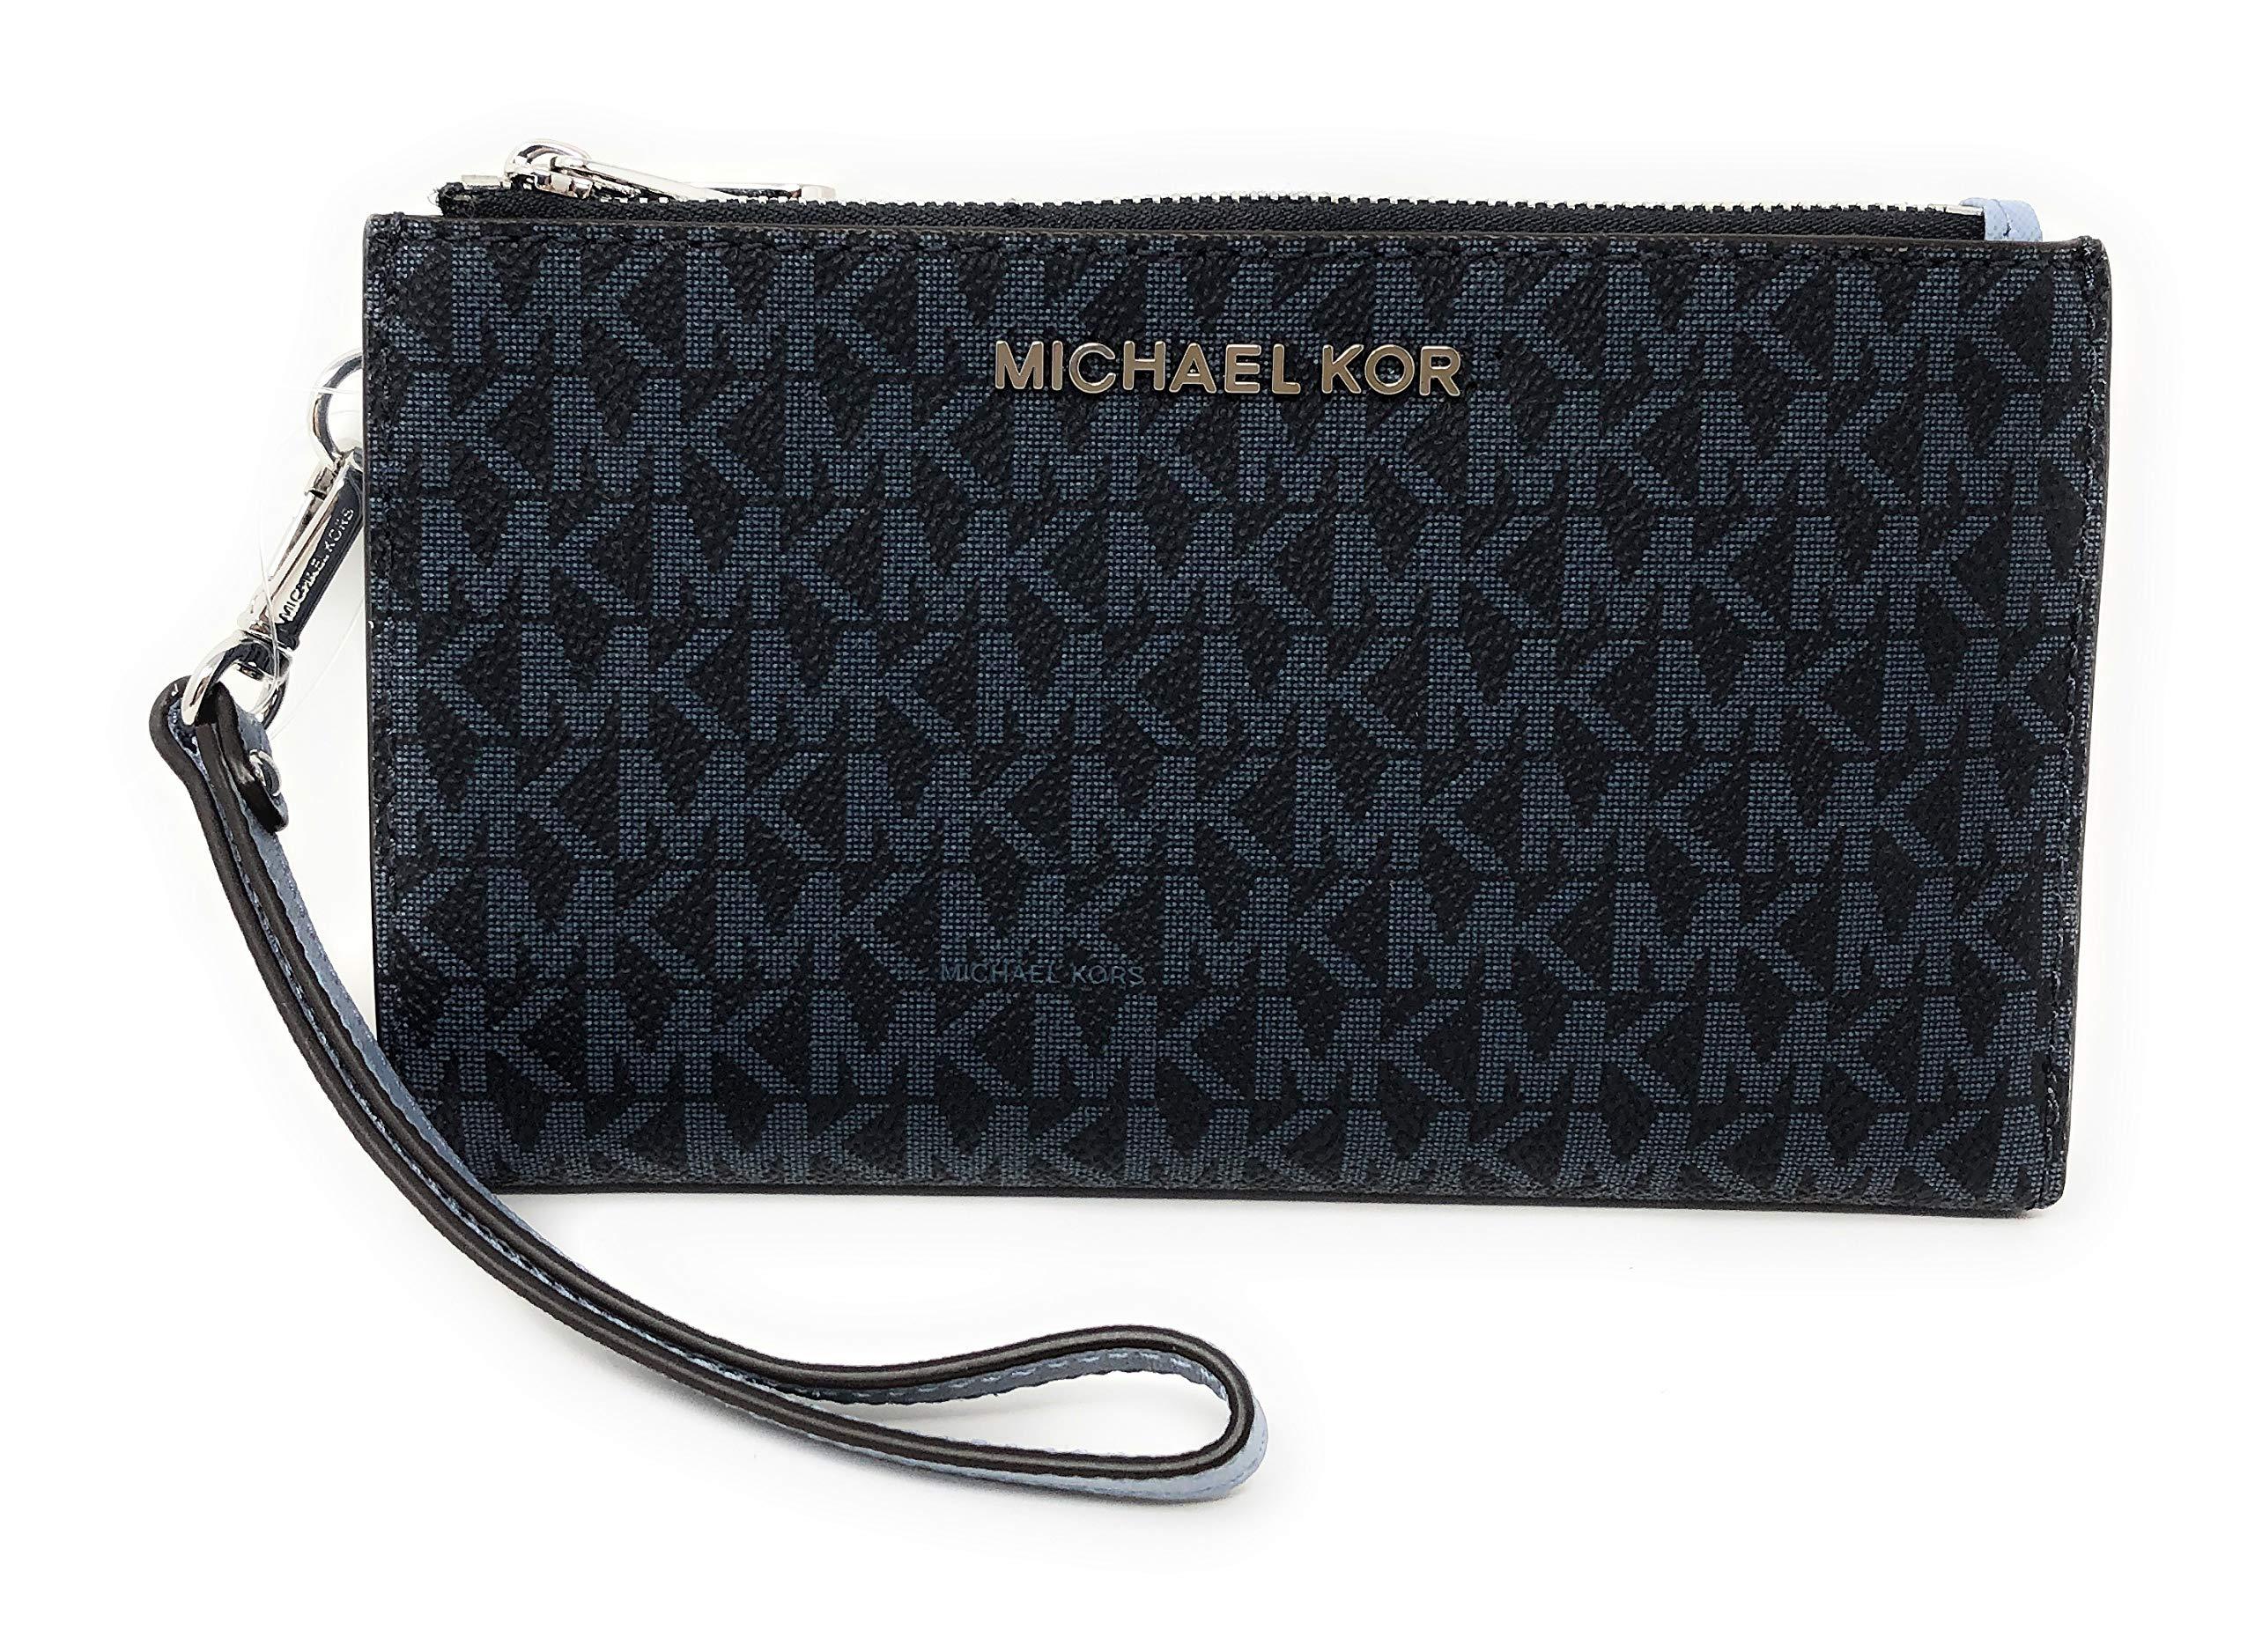 Michael Kors Jet Set Travel Double Zip Saffiano Leather Wristlet Wallet (Navy)